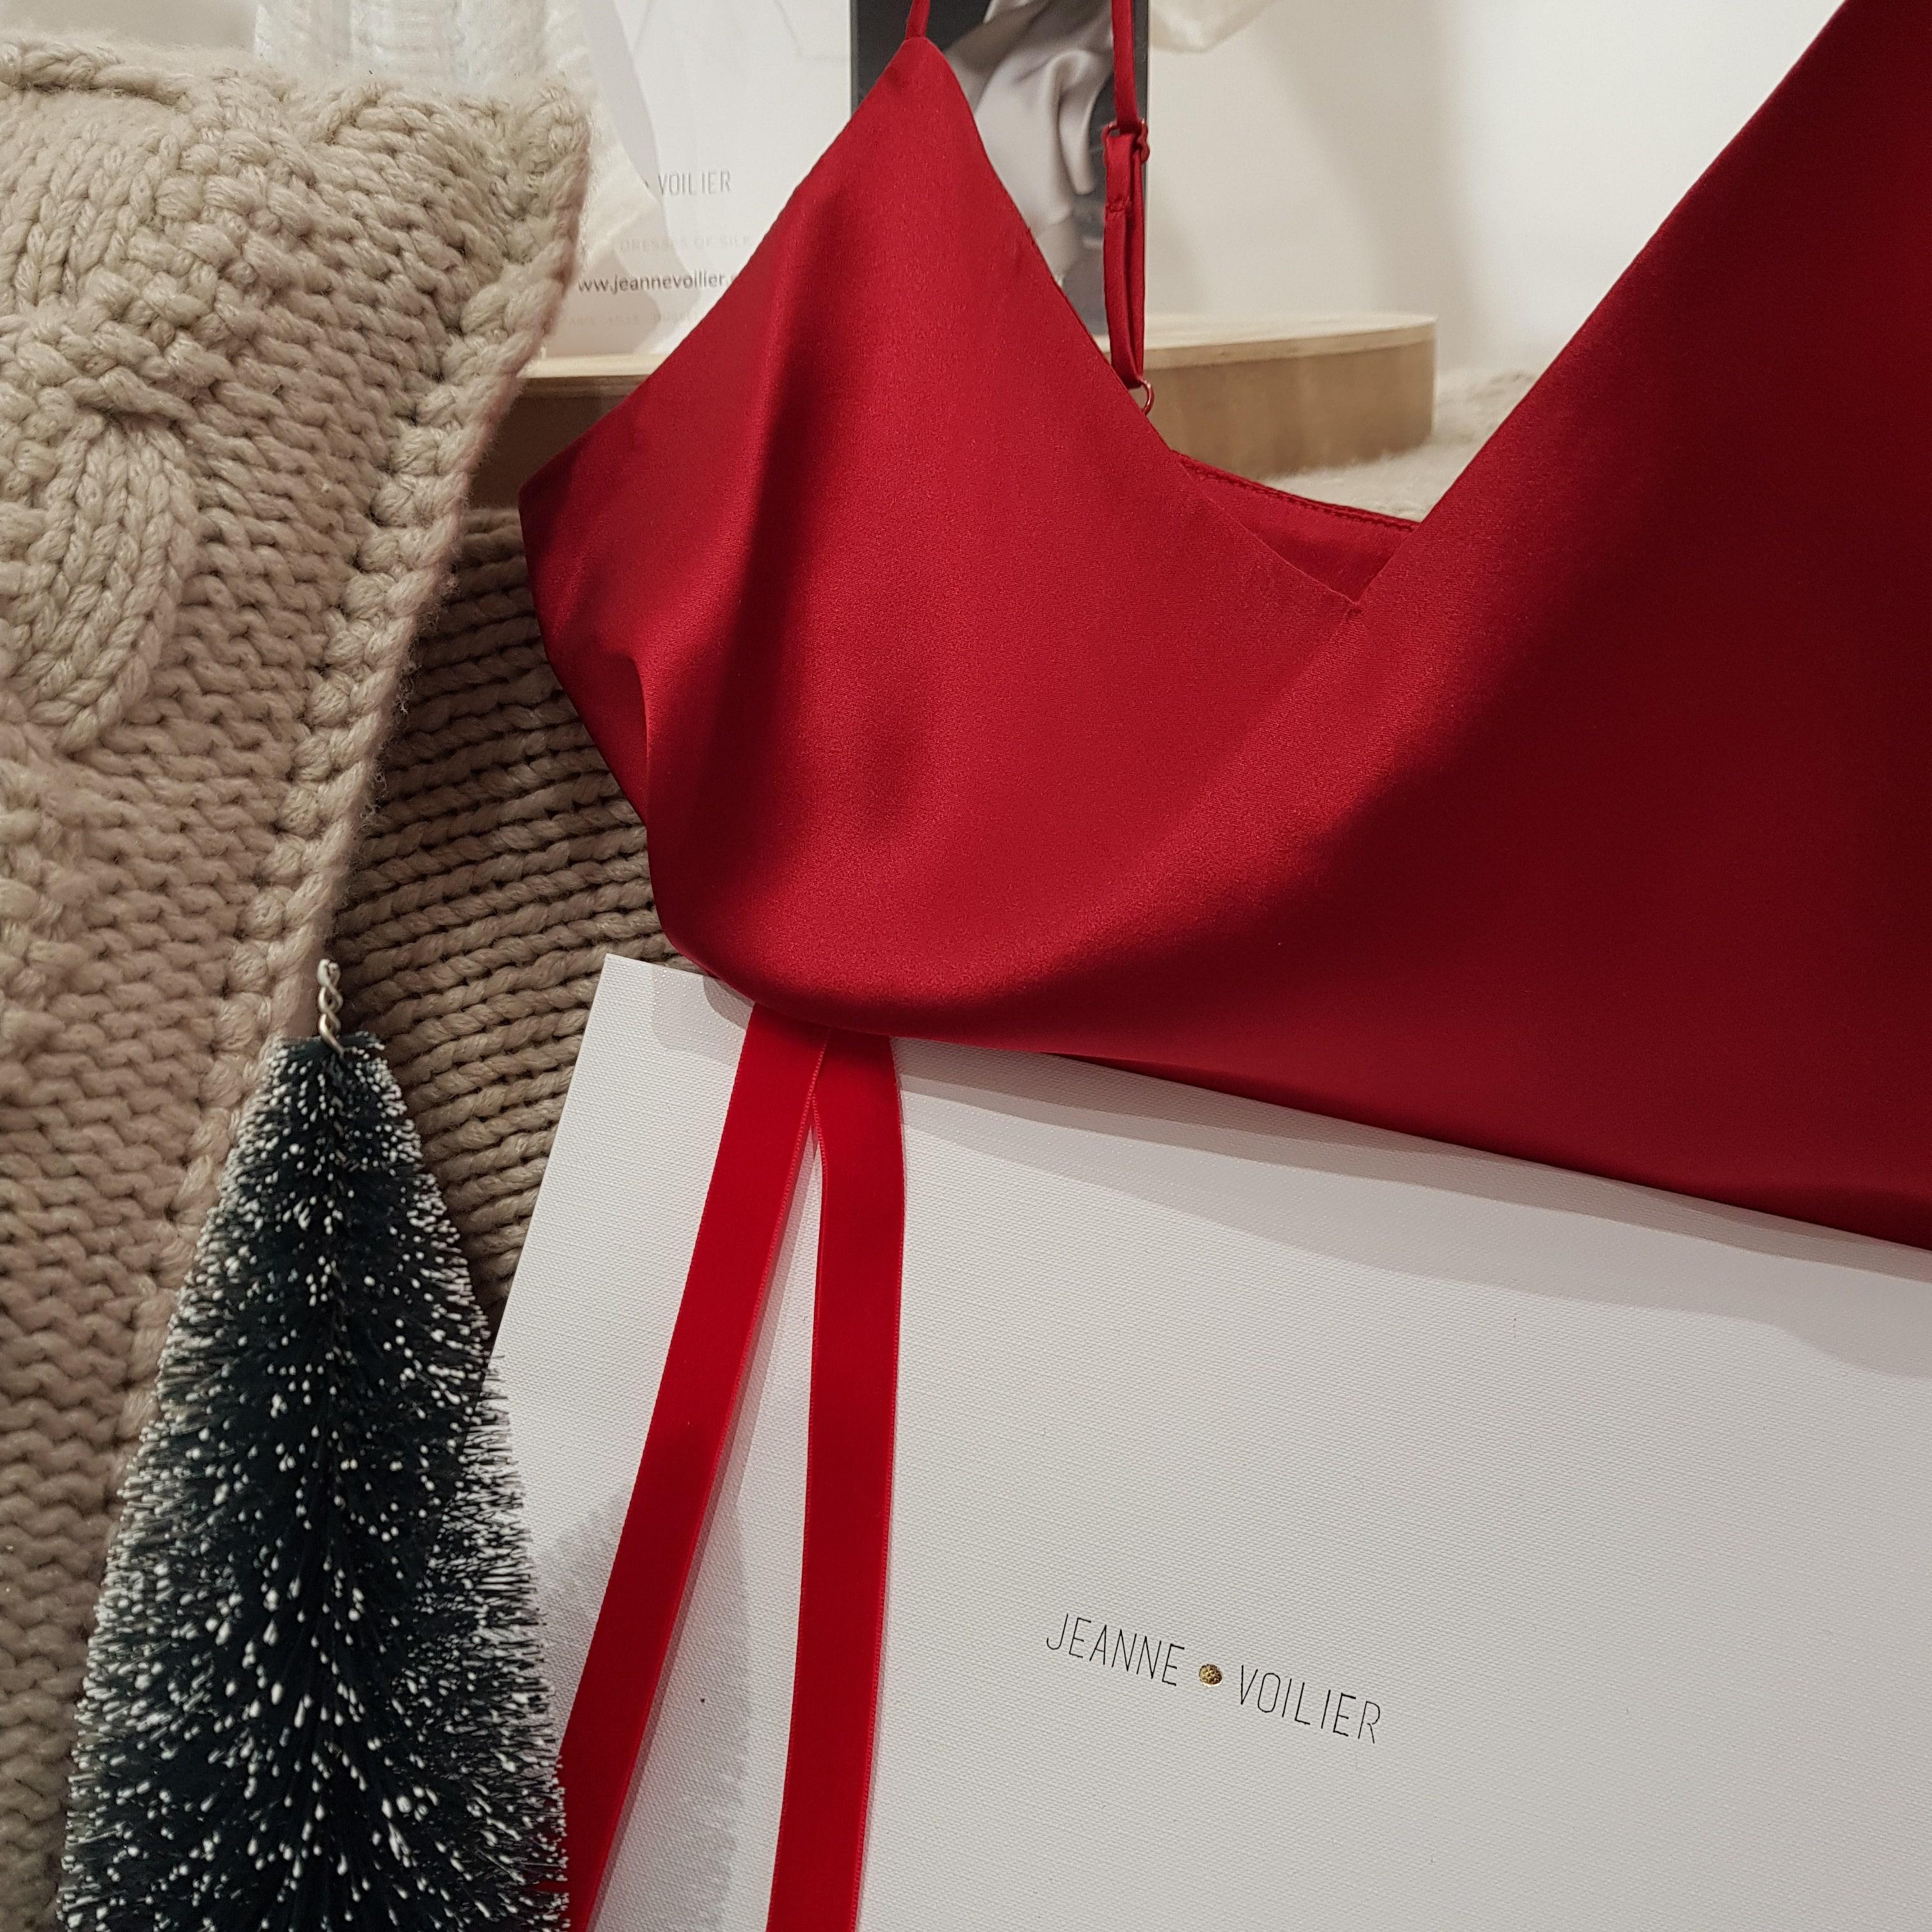 robe en soie Carmin, cadeau de Noël | JEANNE VOILIER